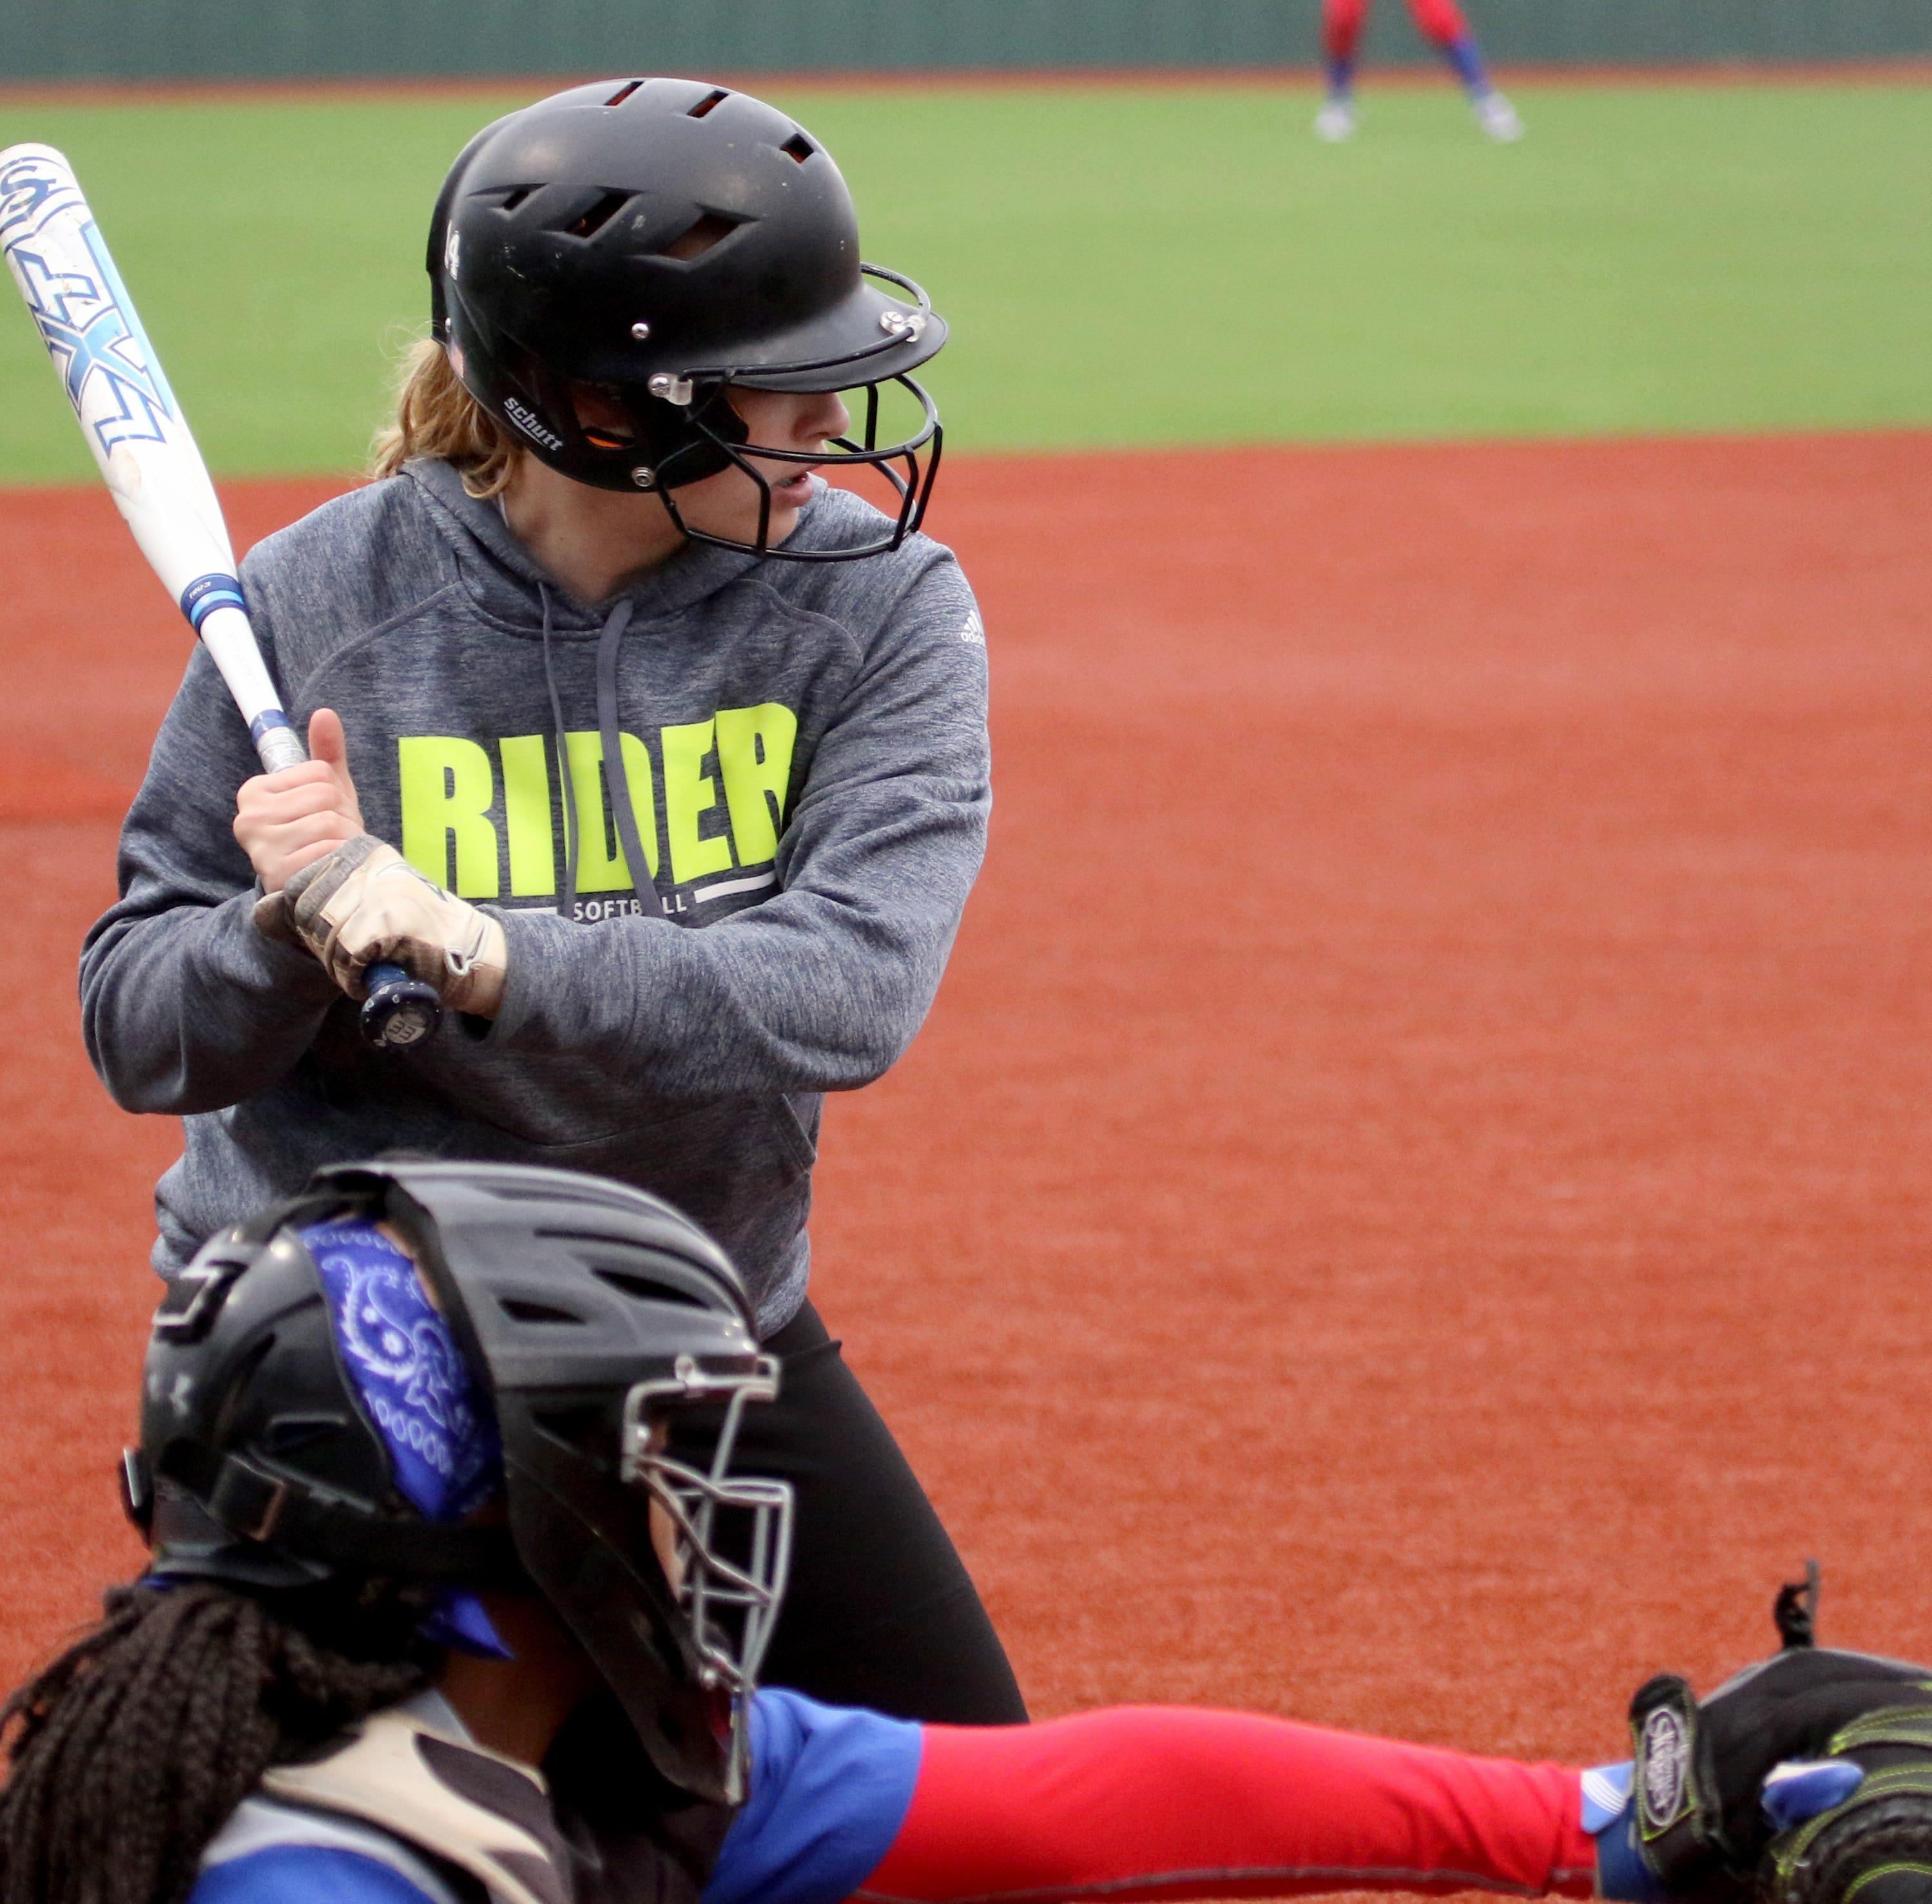 Softball roundup: Rider clinches playoff spot; 8-3A, 8-2A titles shared